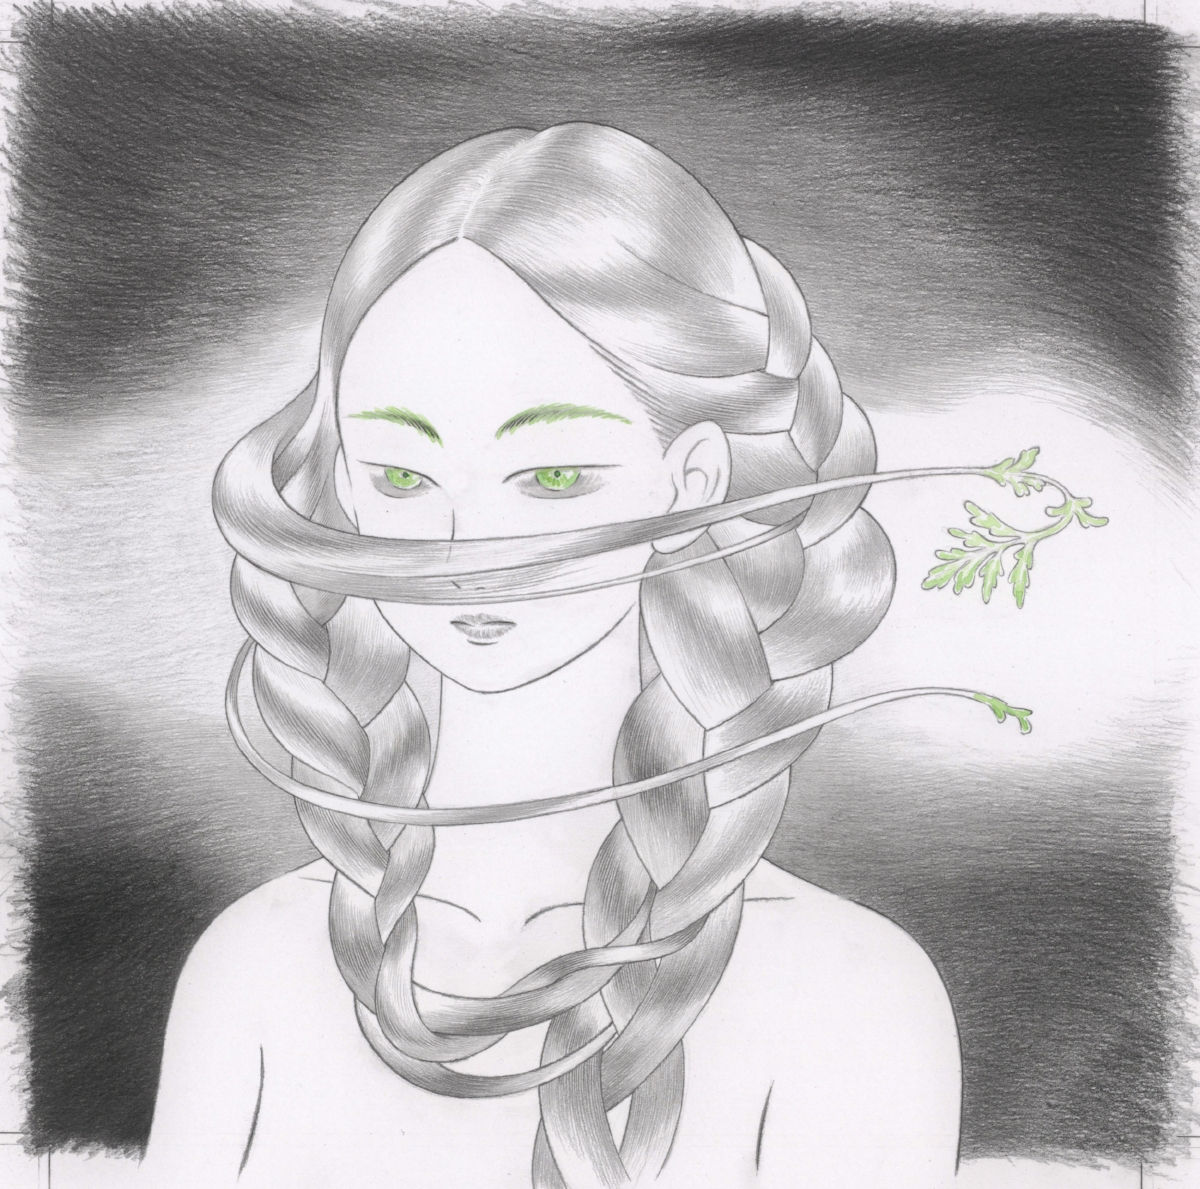 Artwork by Akino Kondoh - Possible Cover Image